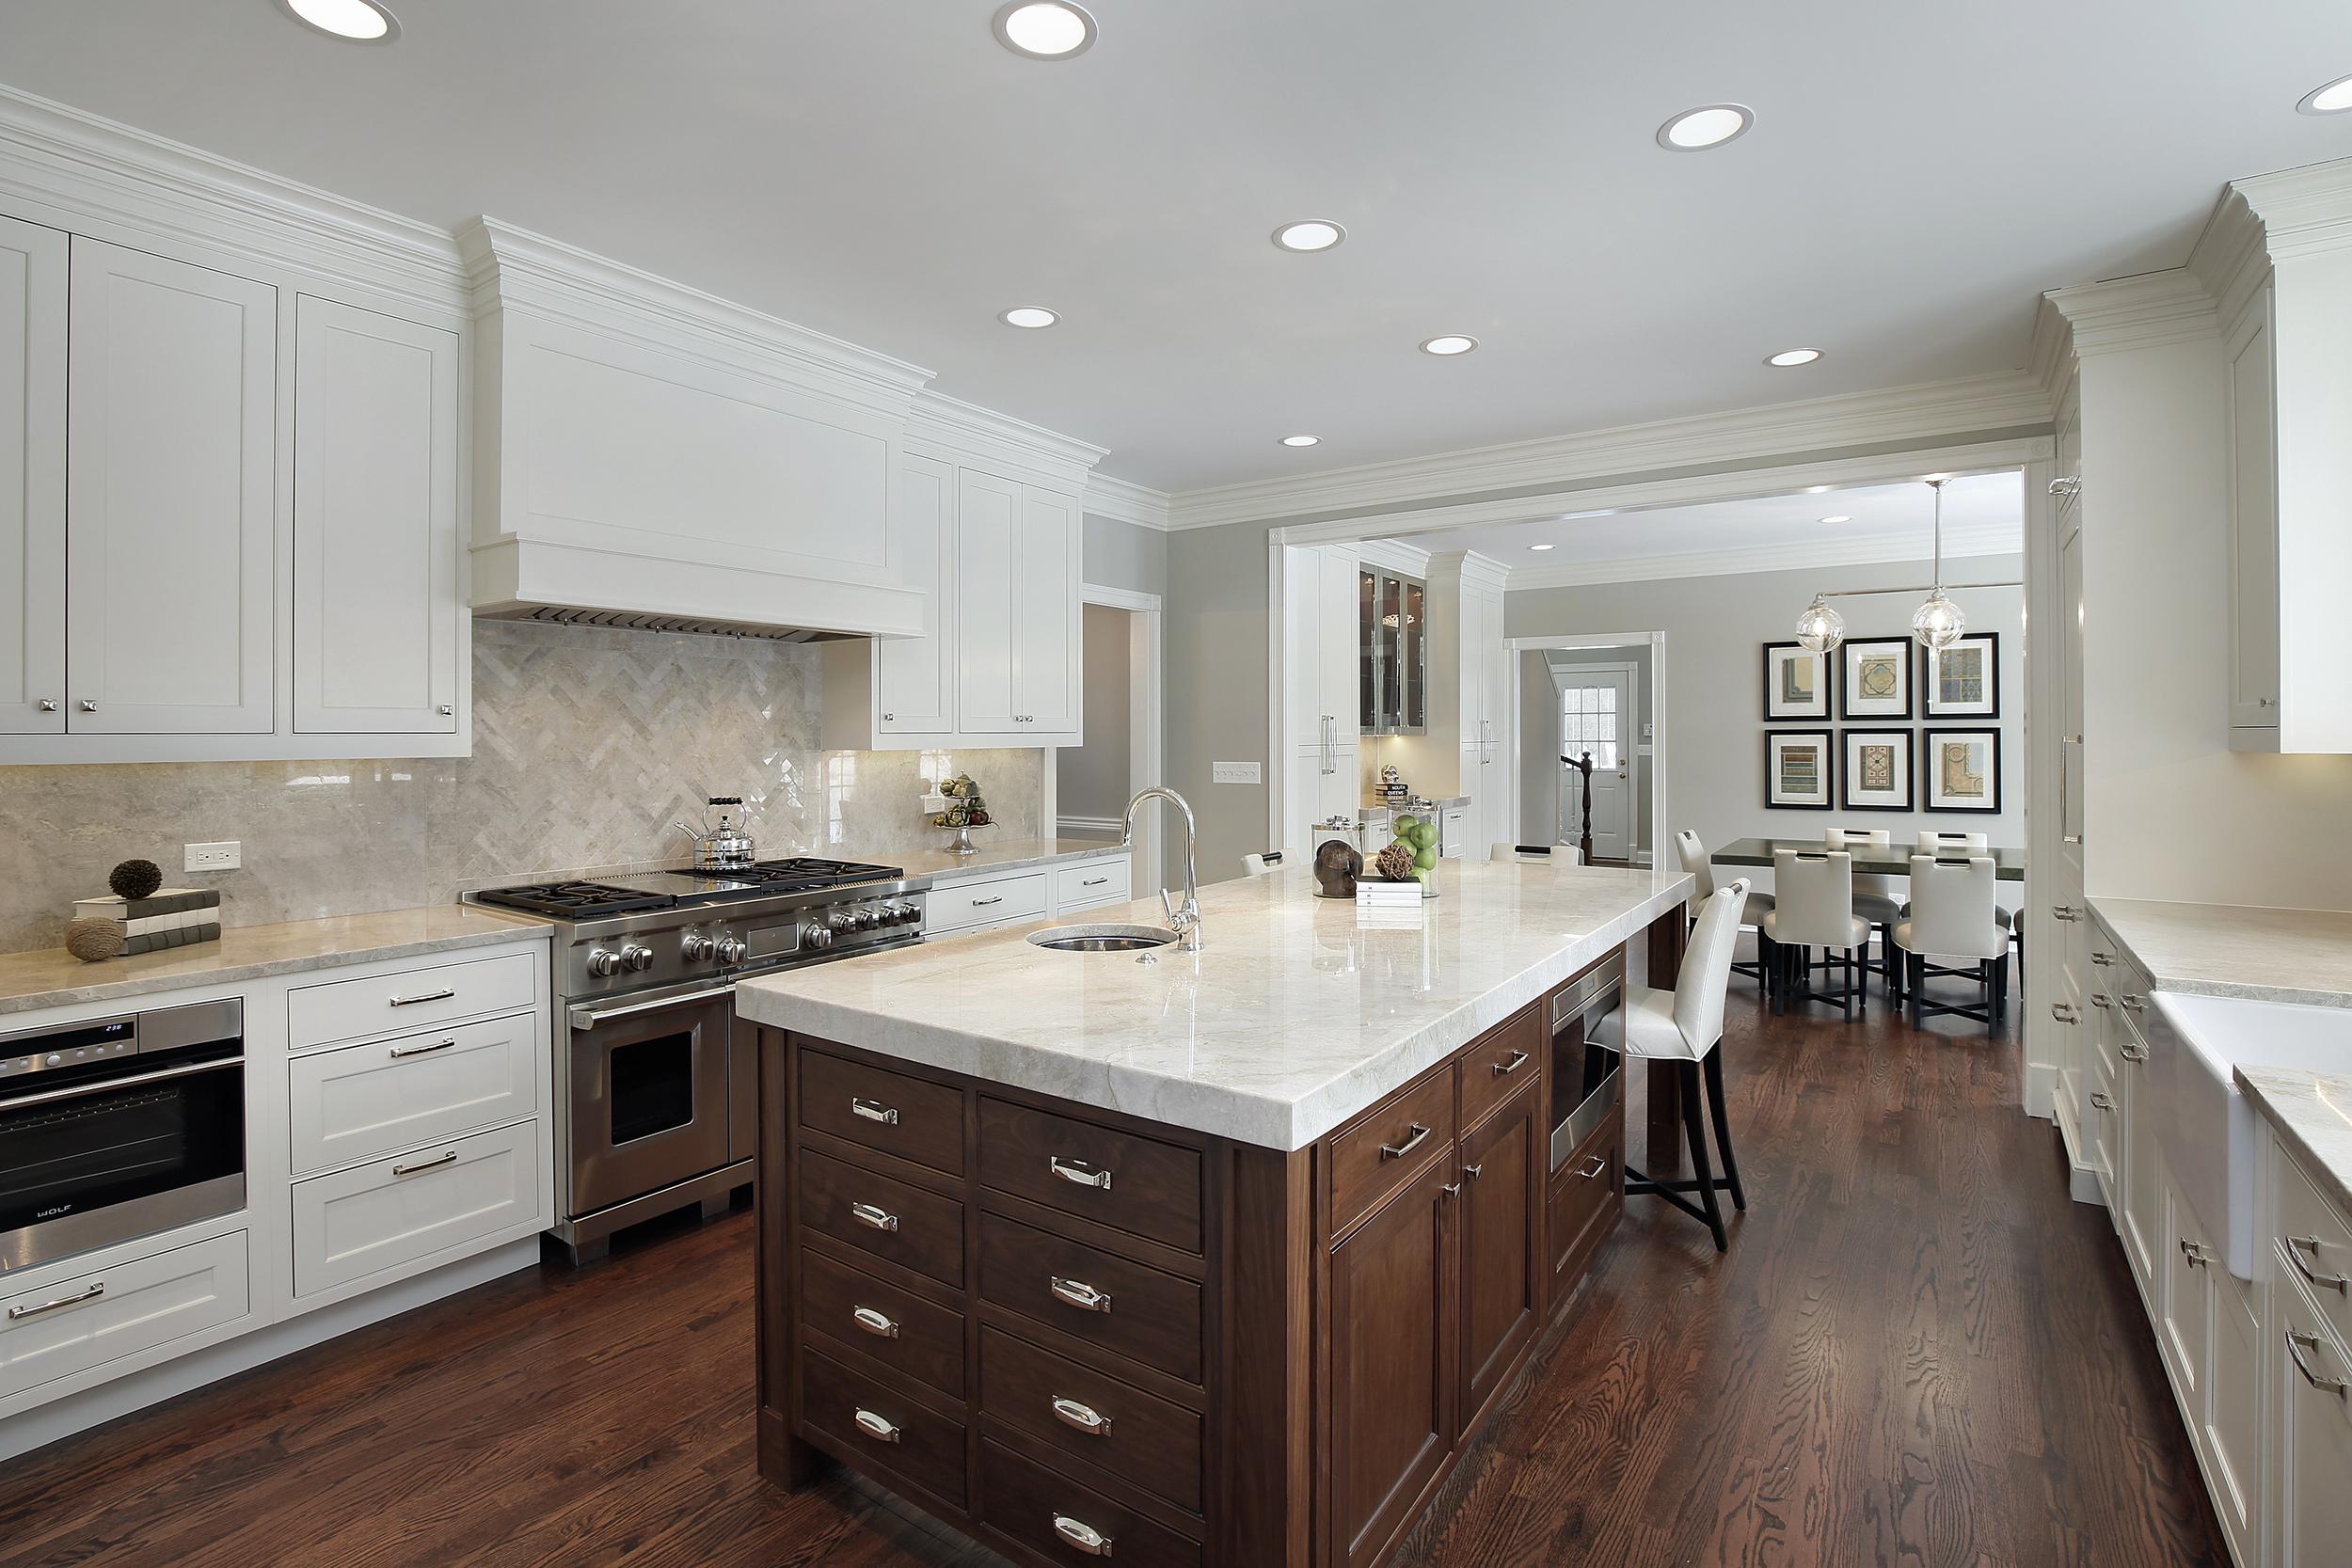 kitchen1_944lakewood.jpg